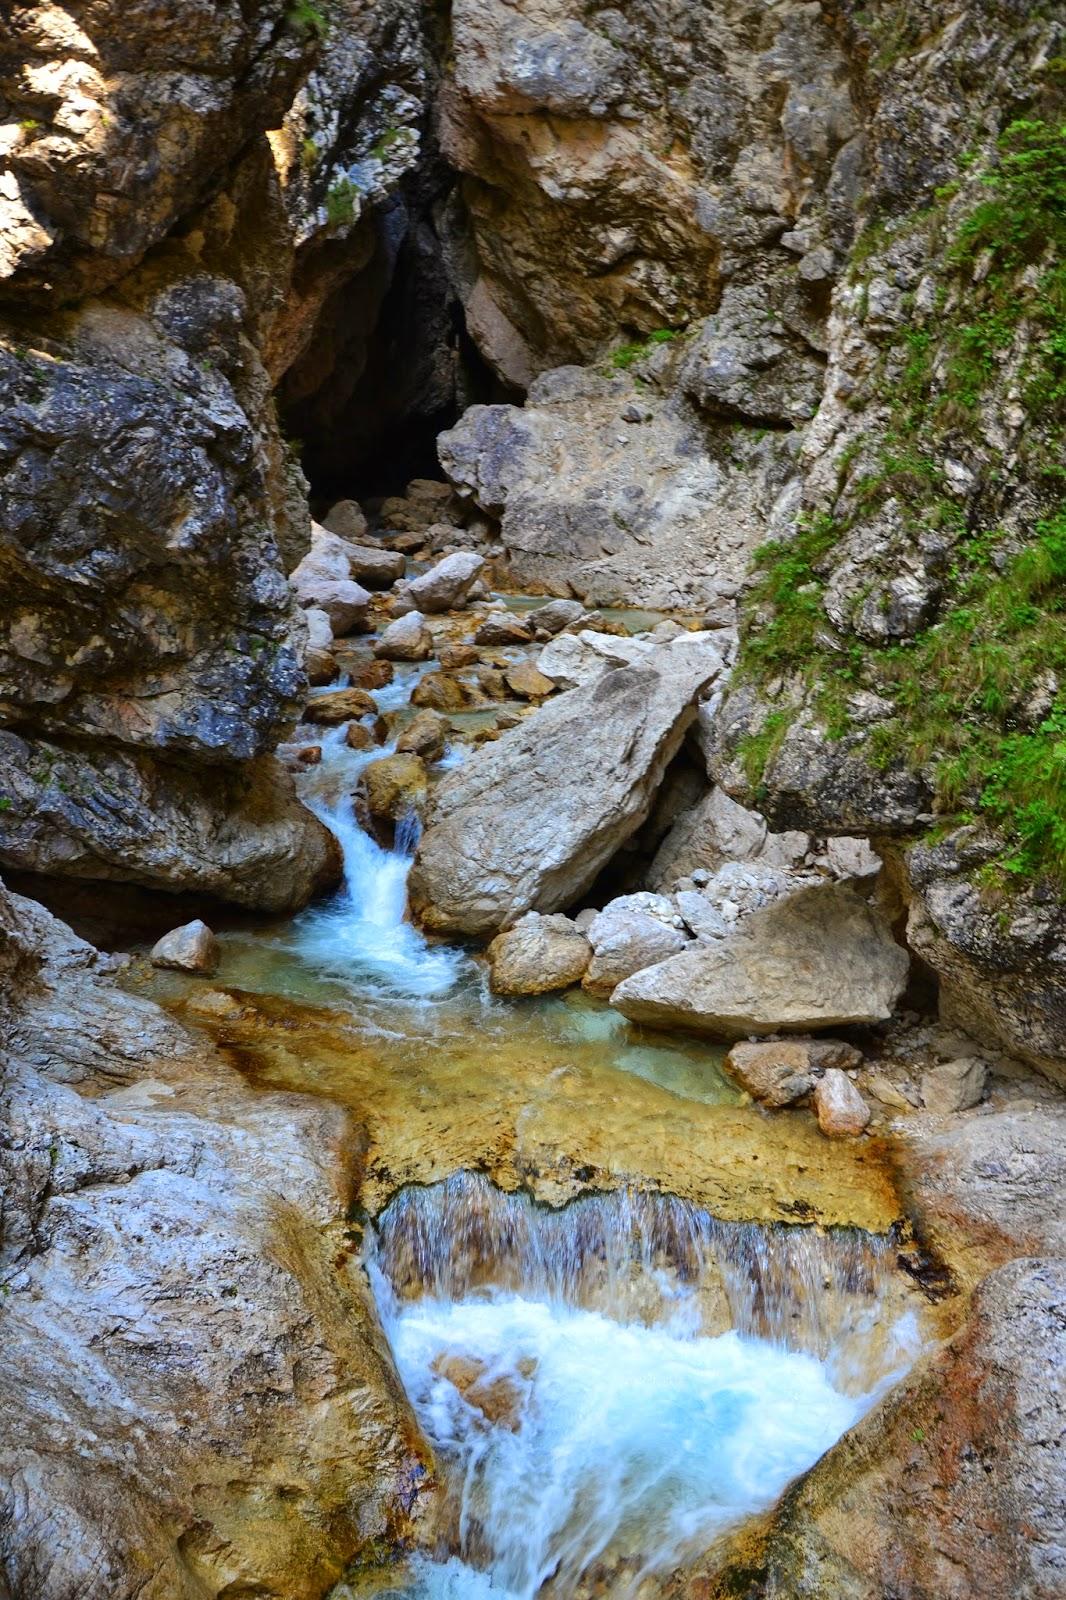 Mlinarice gorge